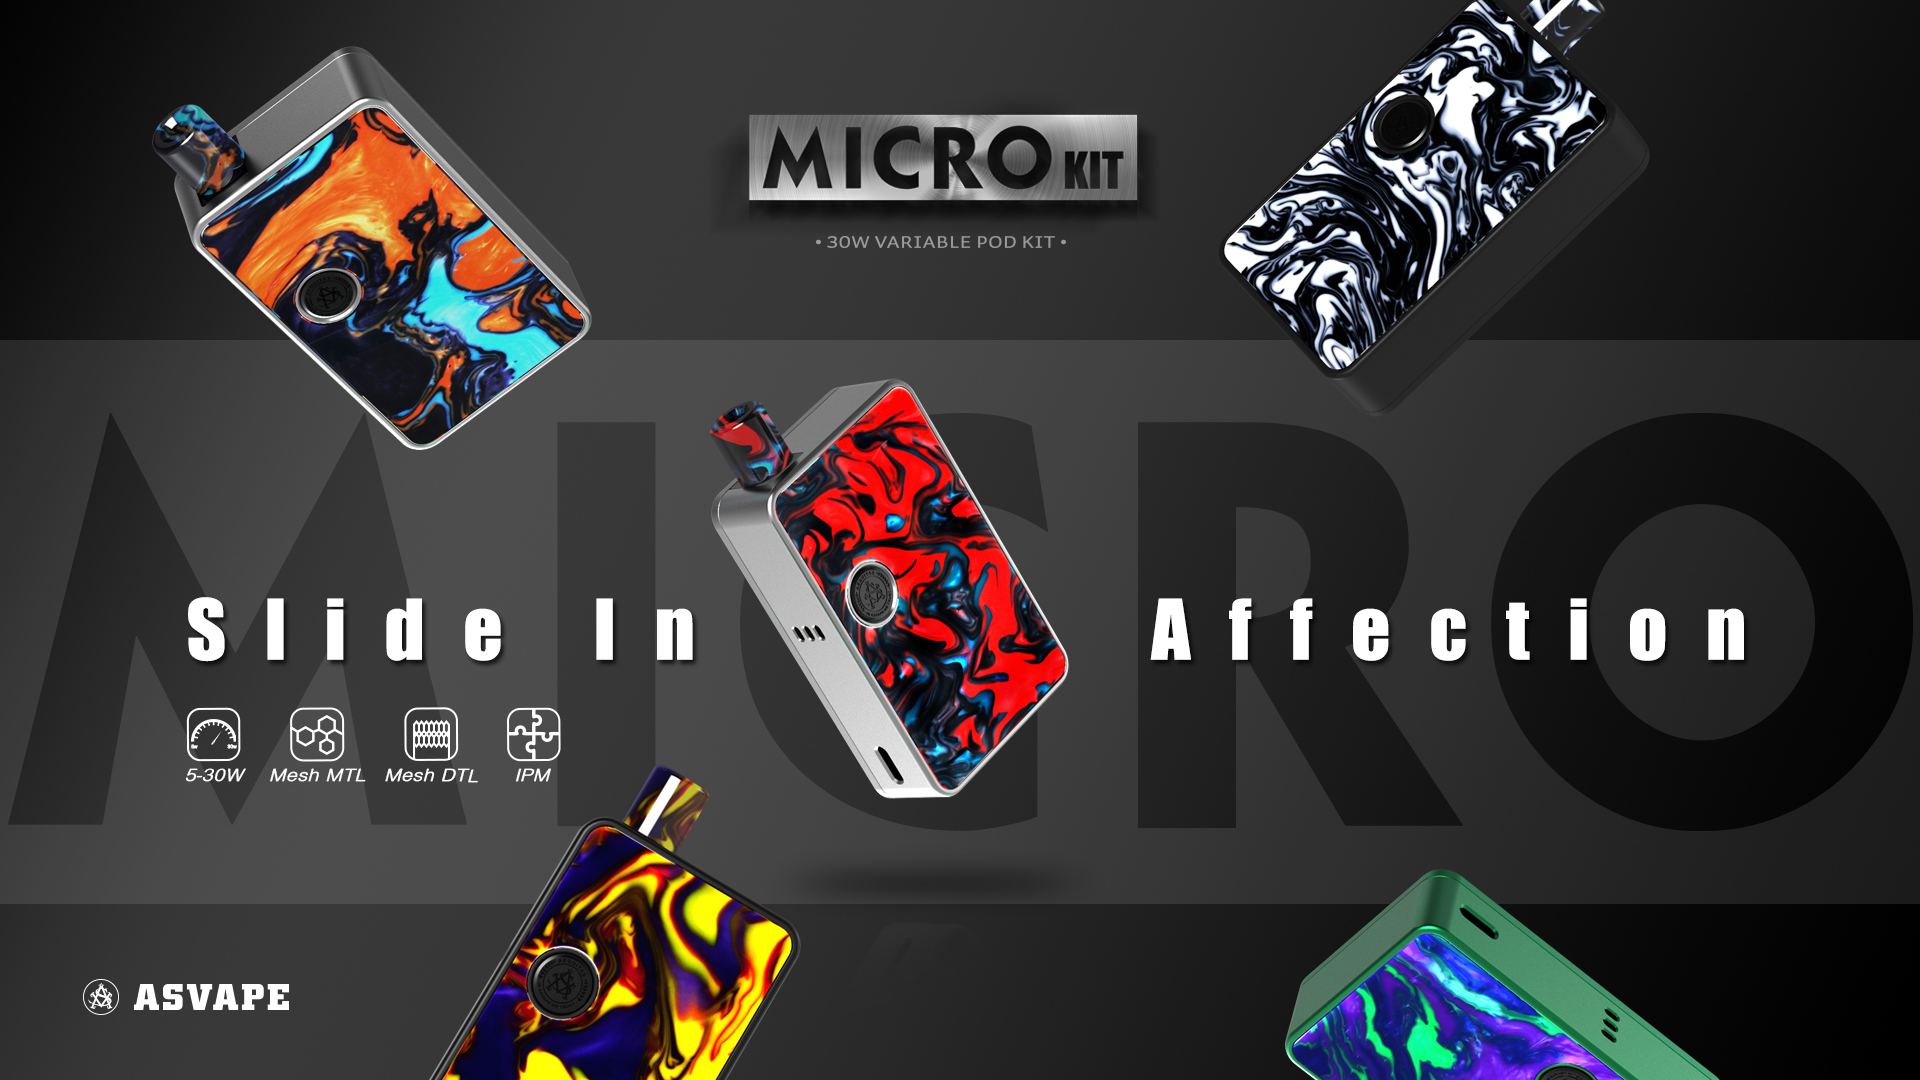 Asvape micro kit vape box mod kit amazon, View micro kit, Asvape Product  Details from Shenzhen Asvape Technology Co , Ltd  on Alibaba com